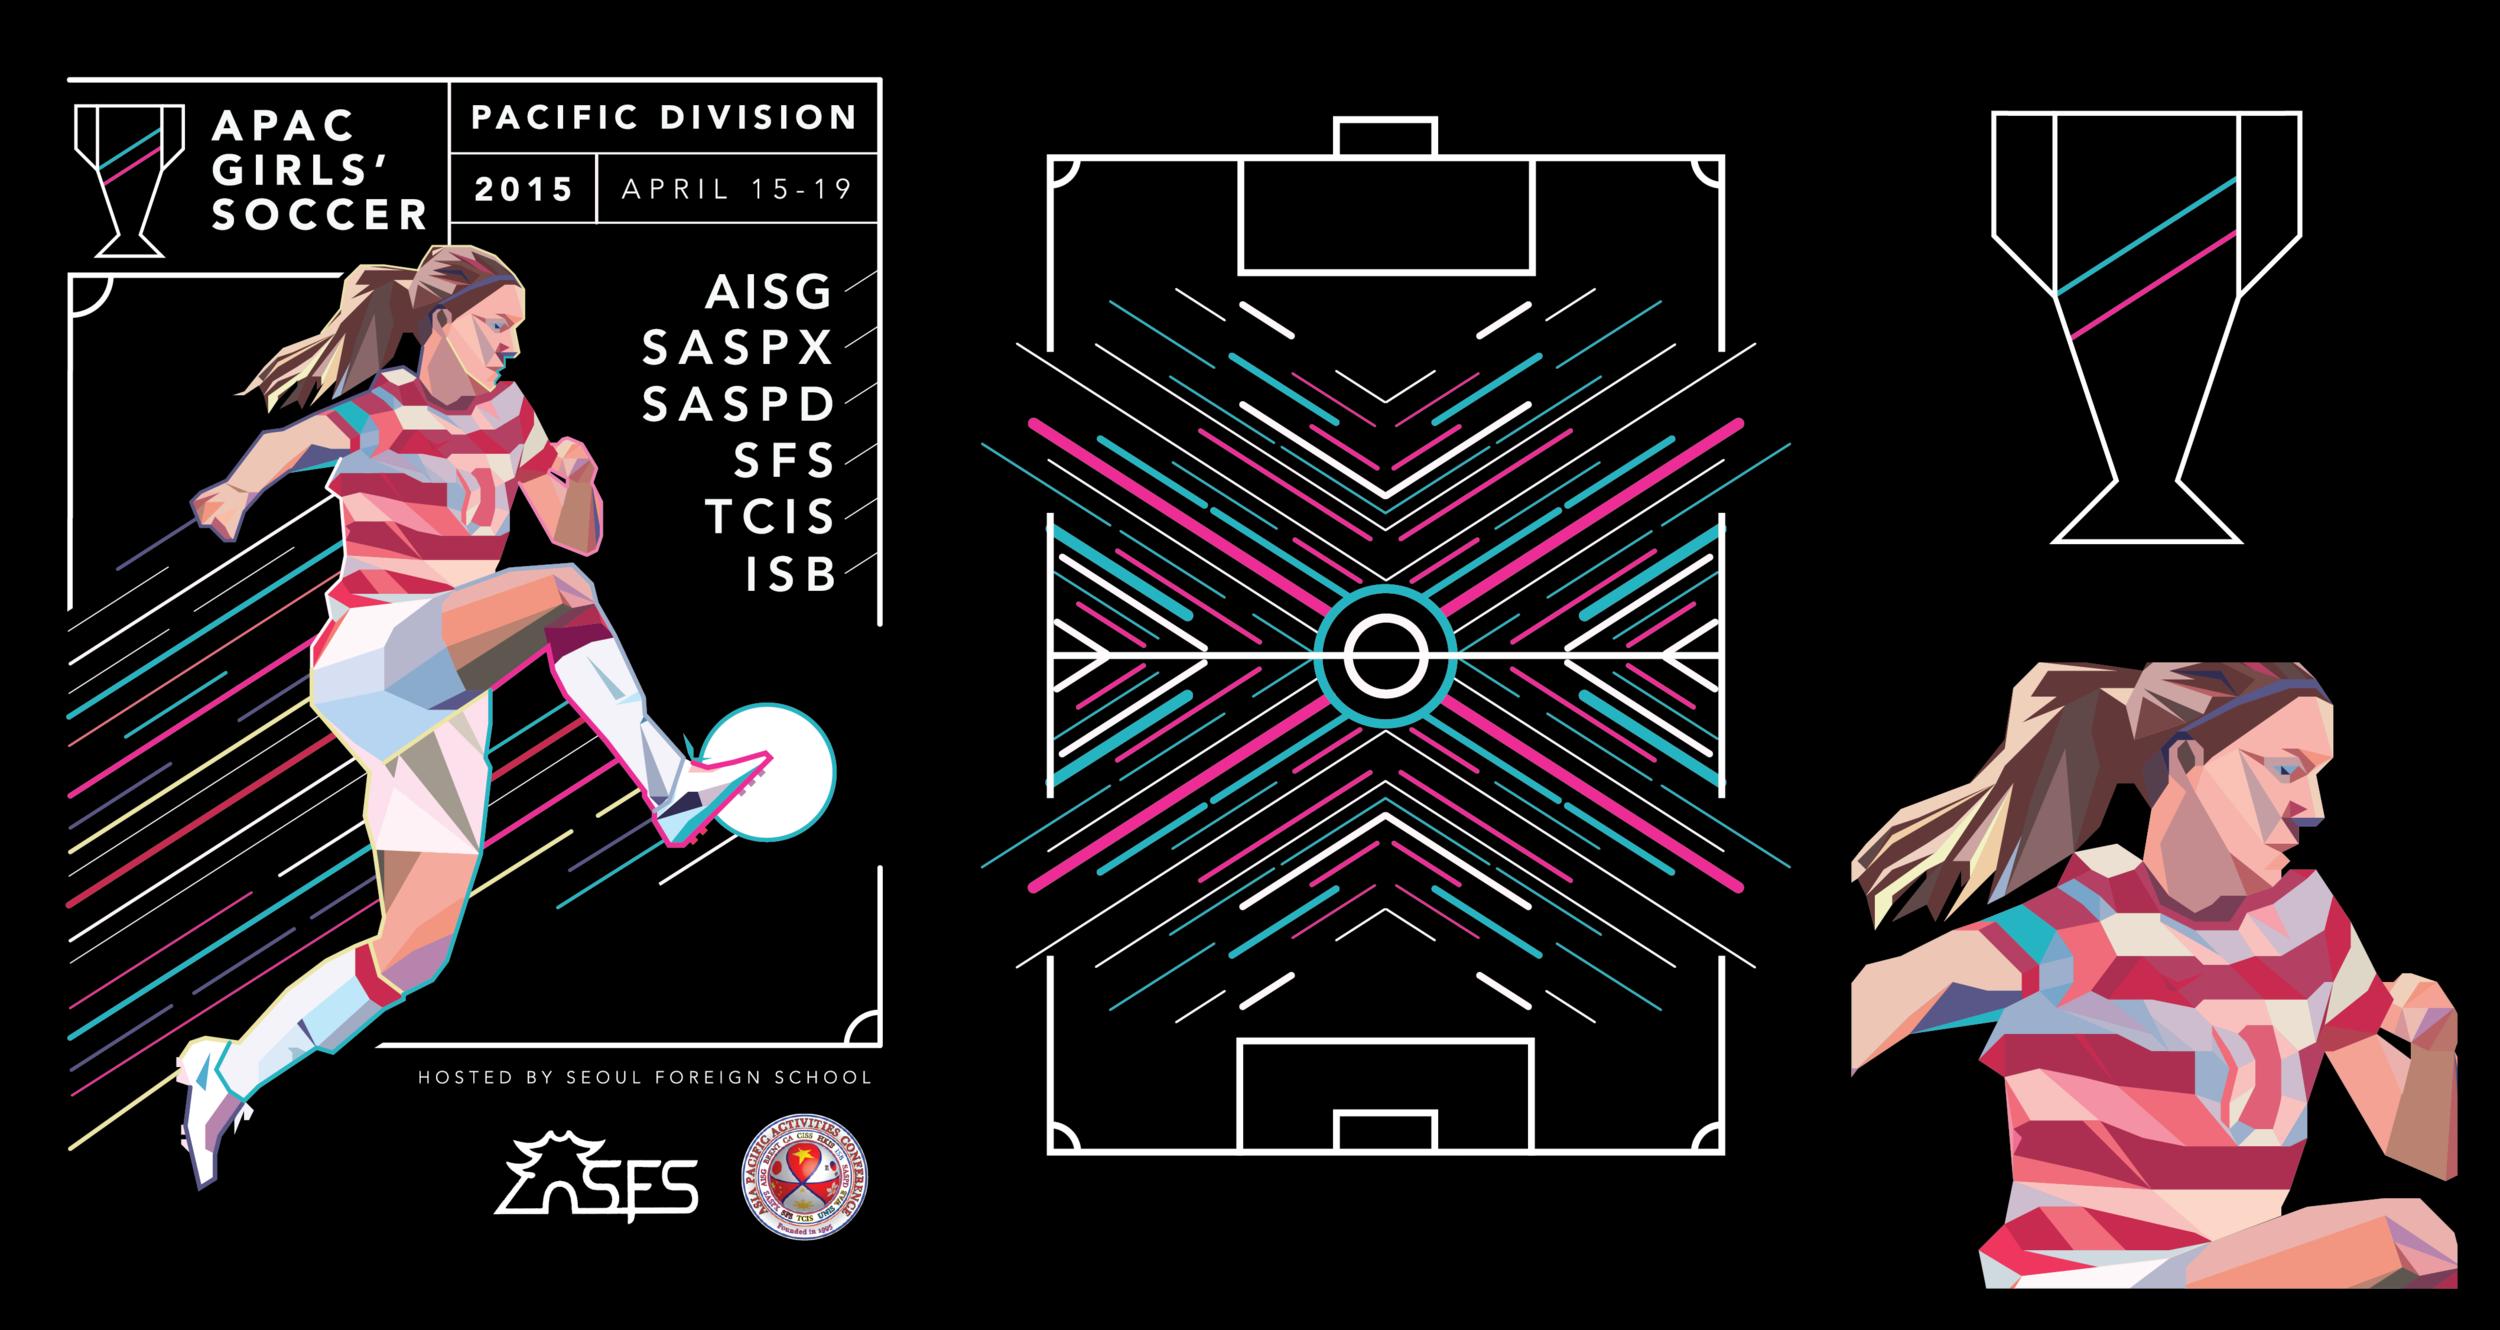 APAC Girls' Soccer - 2015